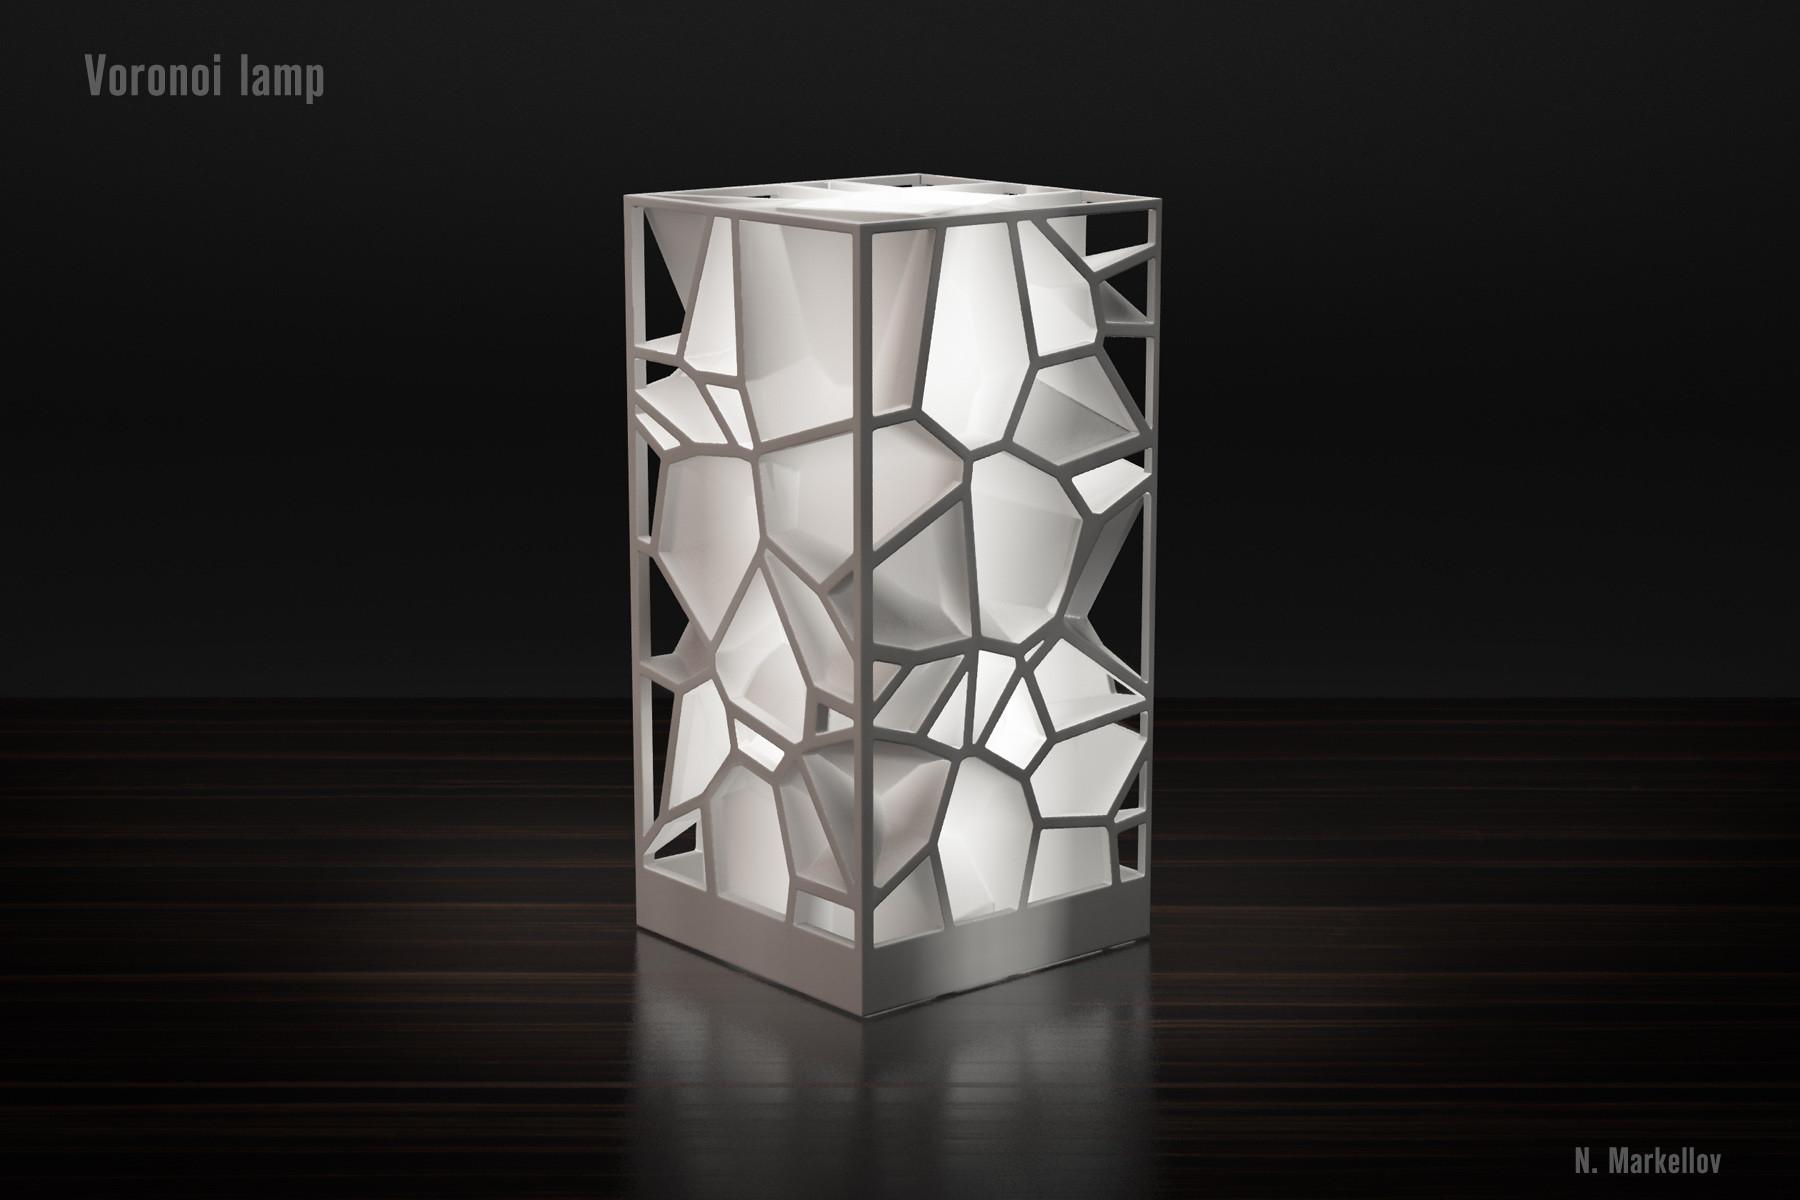 glass seashell vase of voronoi lamp by markellov thingiverse throughout by markellov dec 9 2014 view original